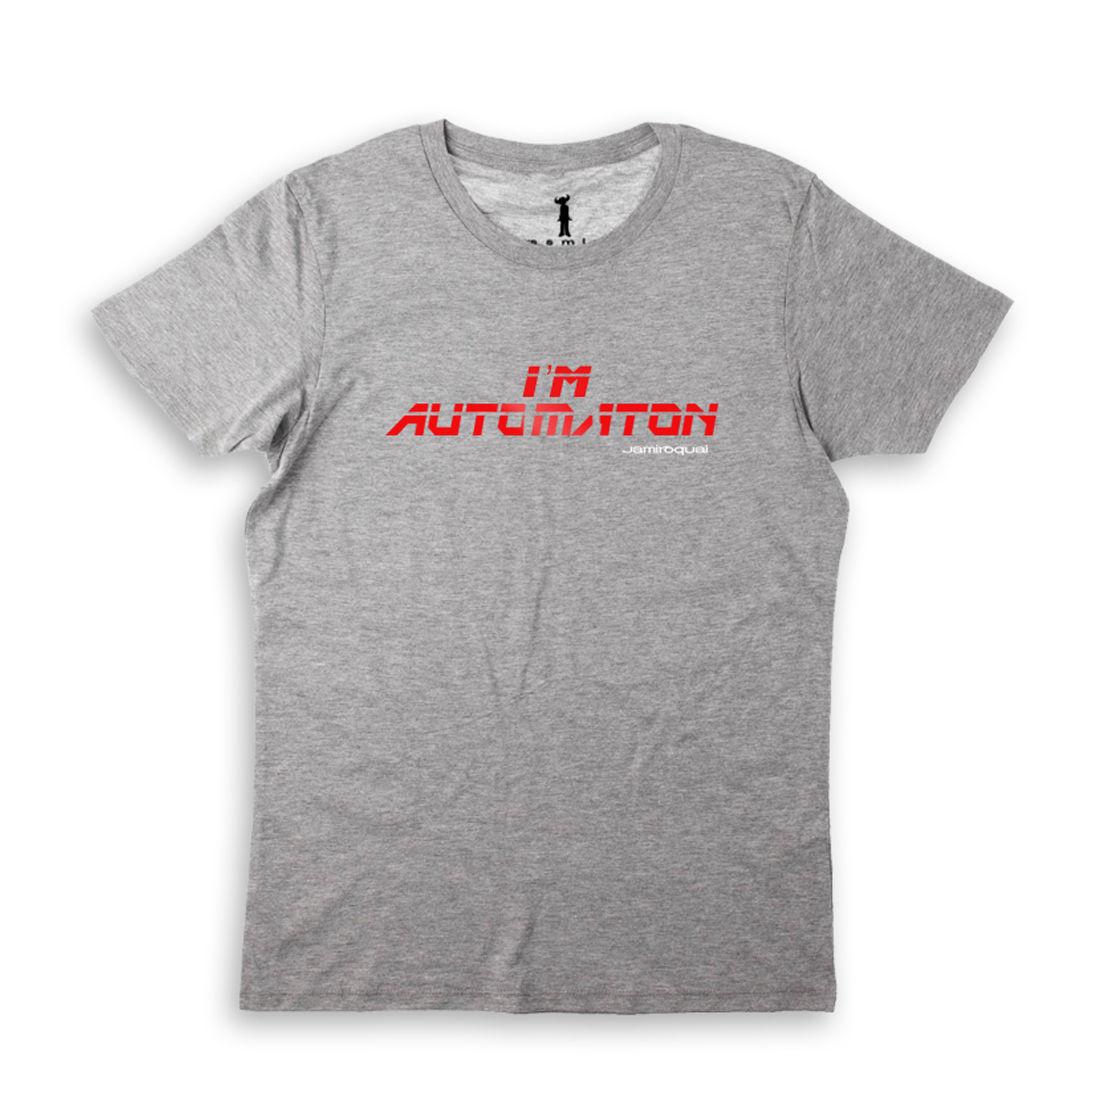 Jamiroquai: I'm Automaton Grey T-Shirt